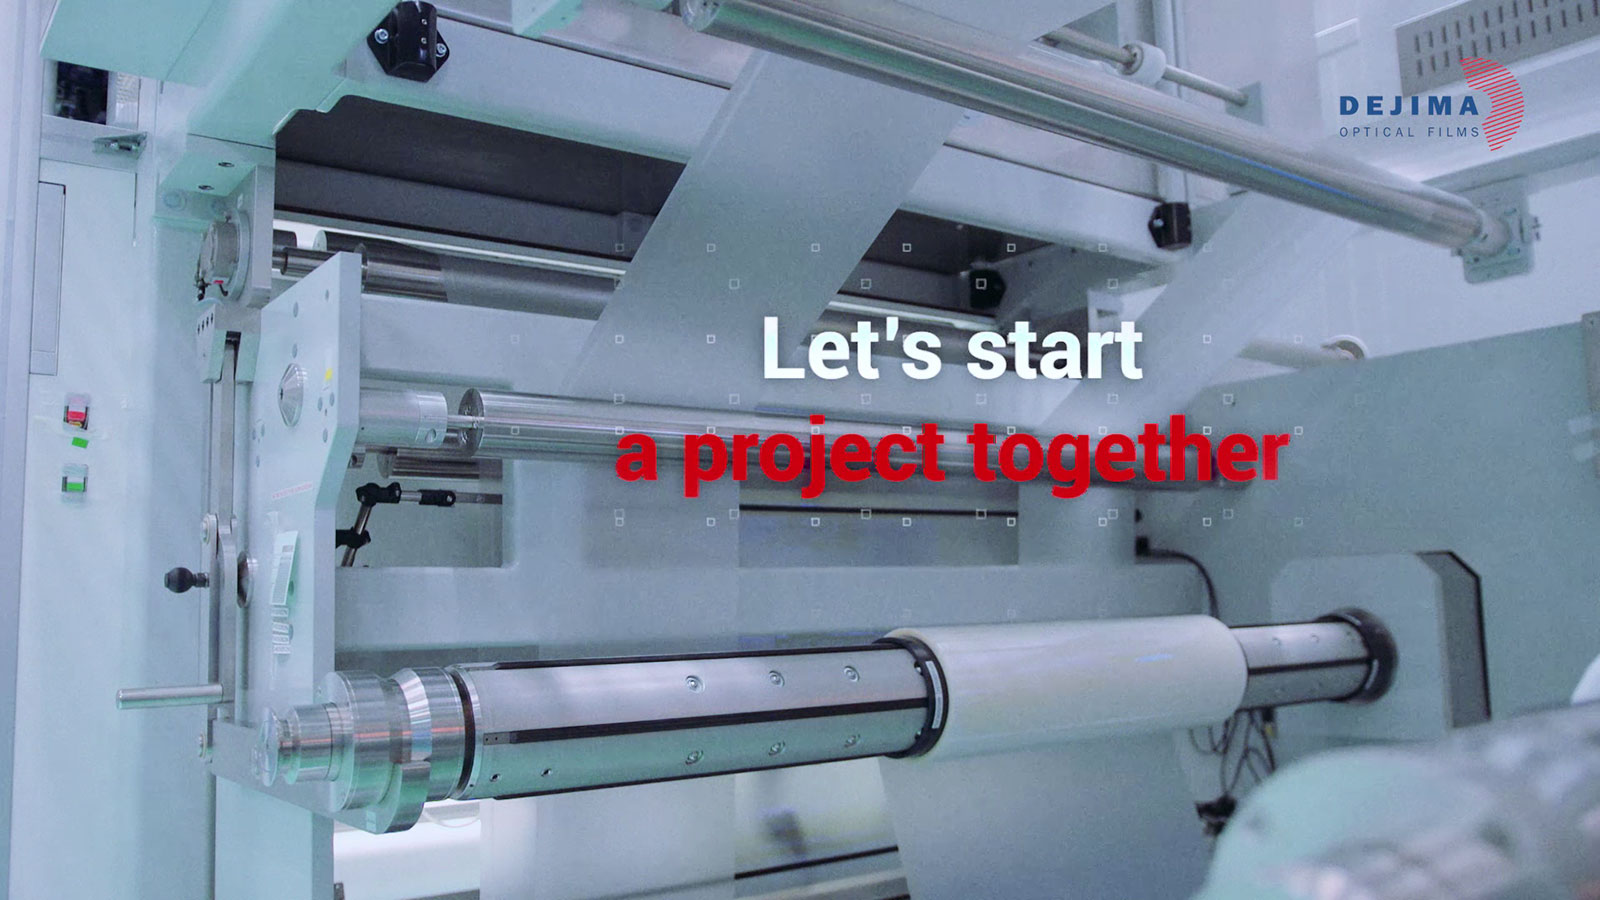 samen moderne videoproductie laten maken Nijmegen